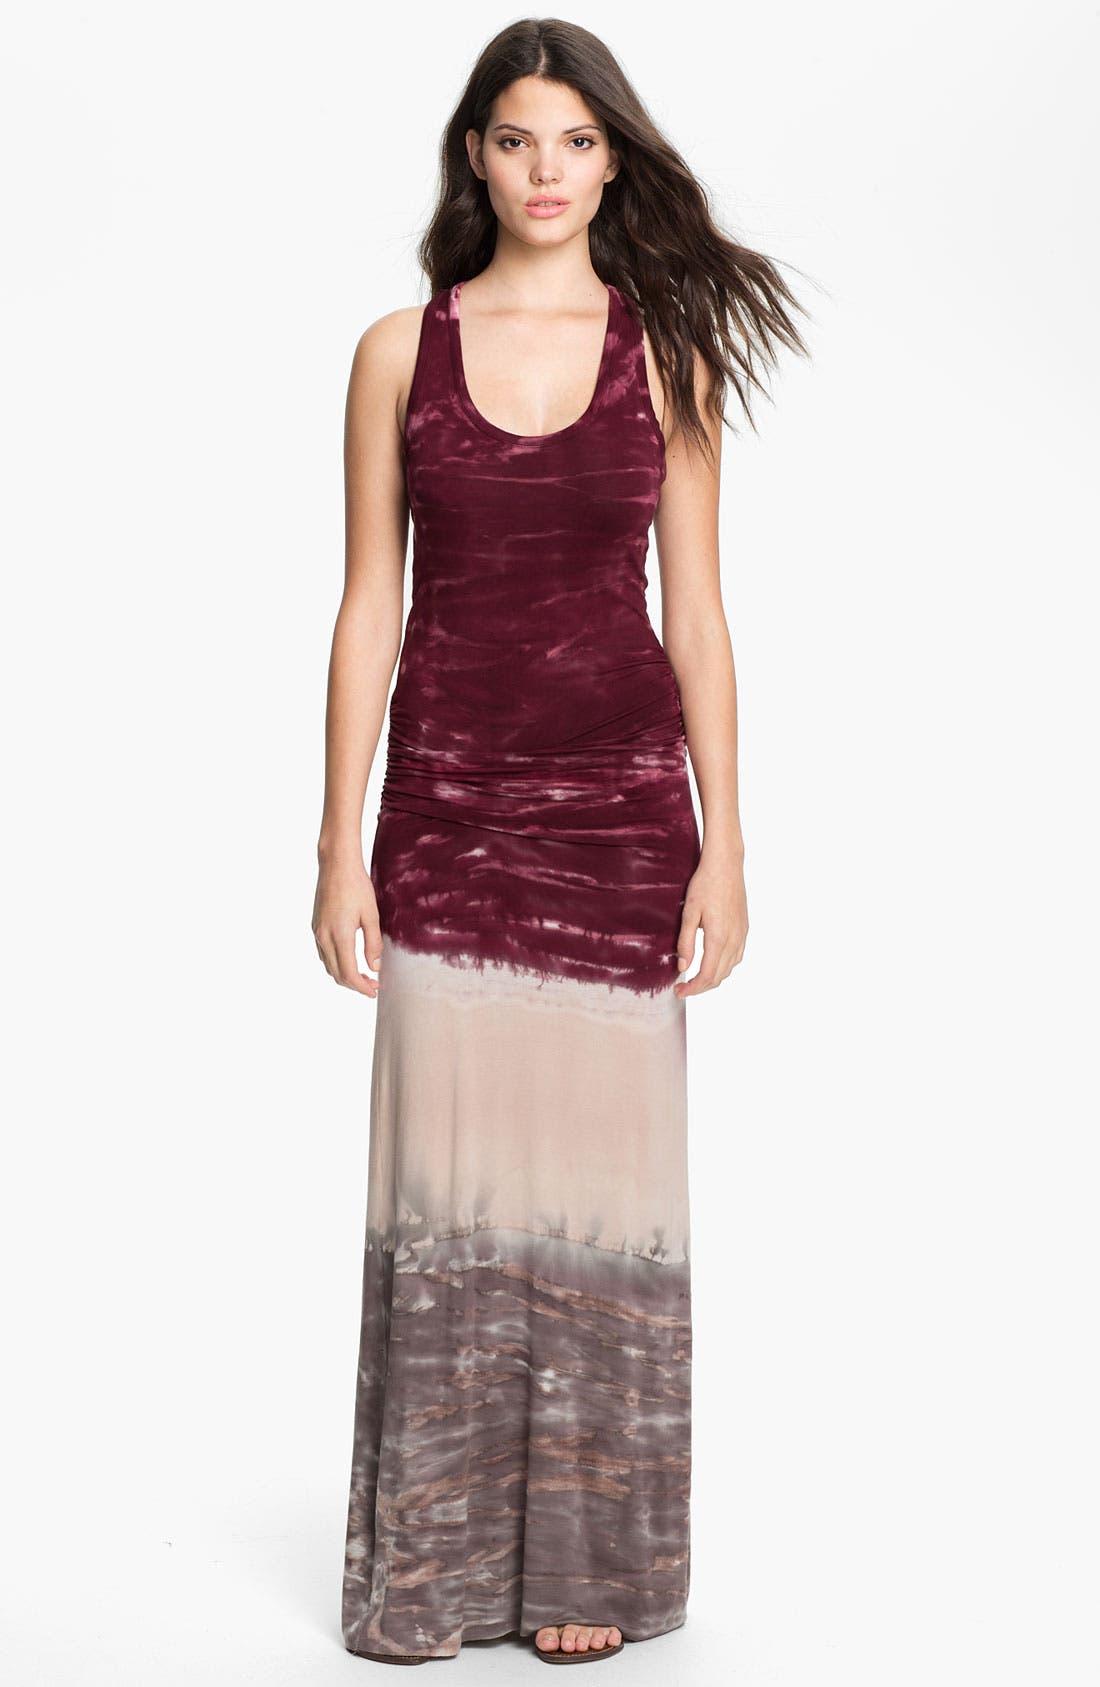 Main Image - Young, Fabulous & Broke 'Hamptons' Maxi Dress (Nordstrom Exclusive)